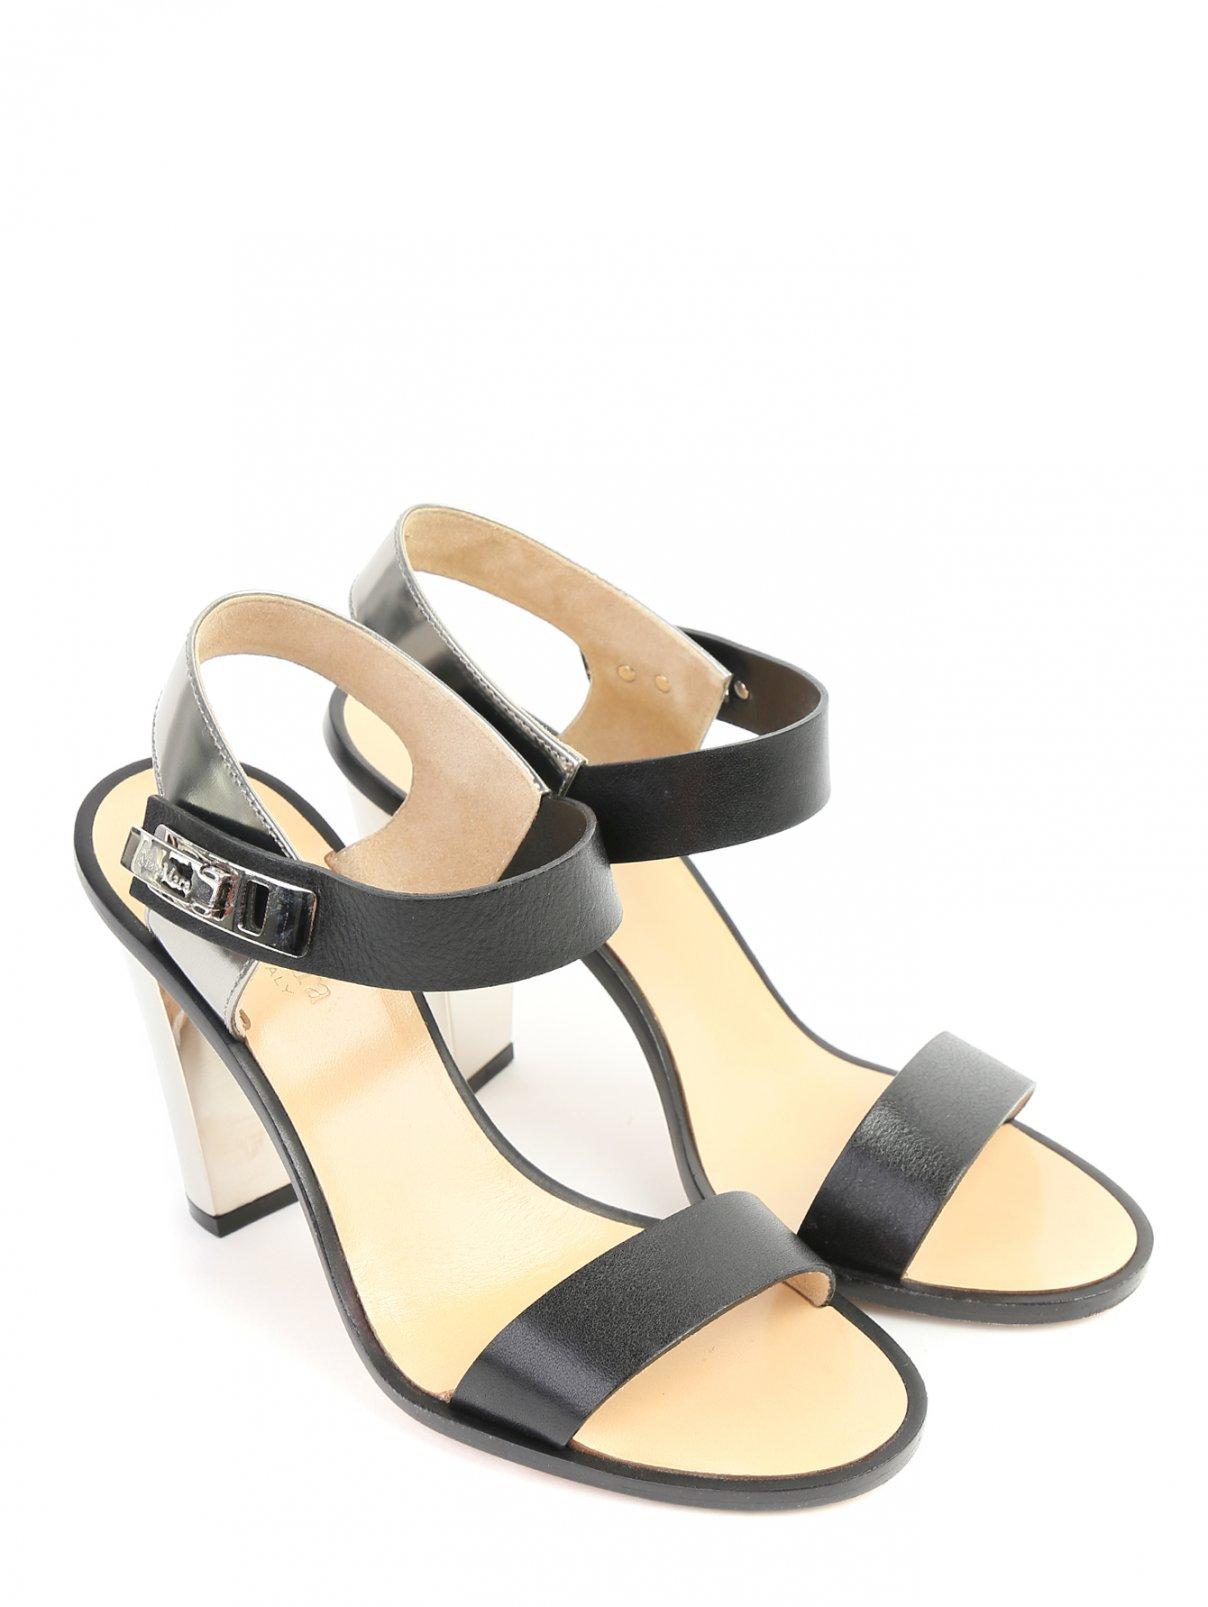 Туфли Max Mara  –  Общий вид